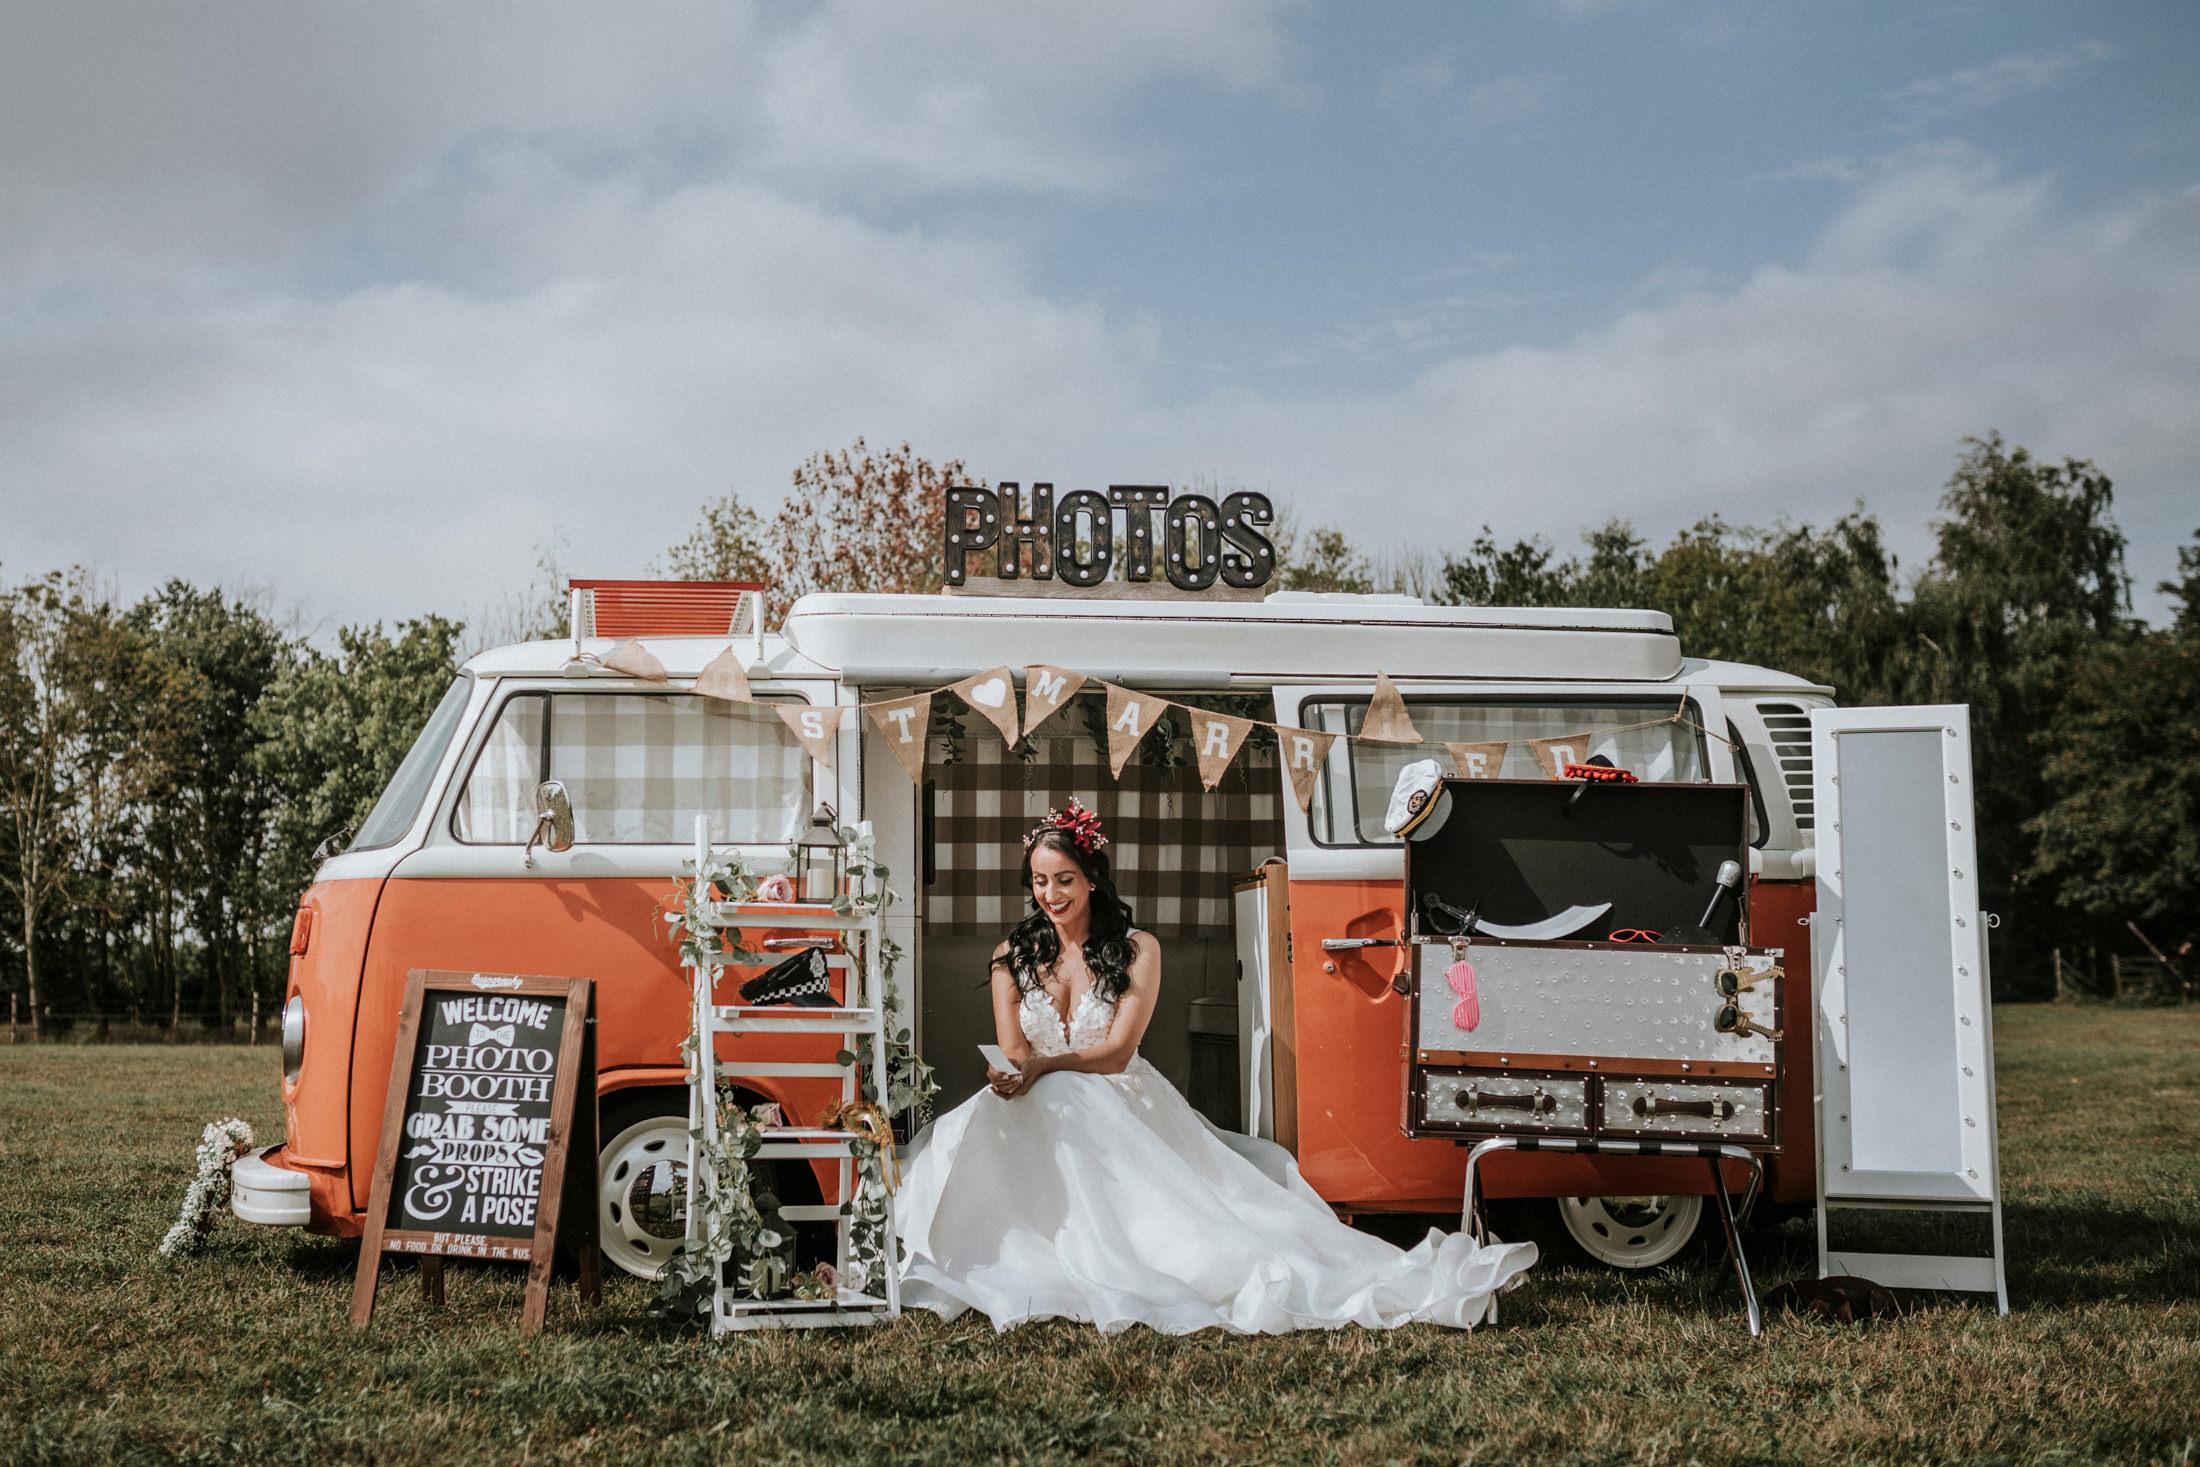 wedding photo booth - camper van photo booth - wedding camper van - outdoor wedding entertainment Woodland Wedding - nottingham outdoor wedding venue - east midlands wedding planner